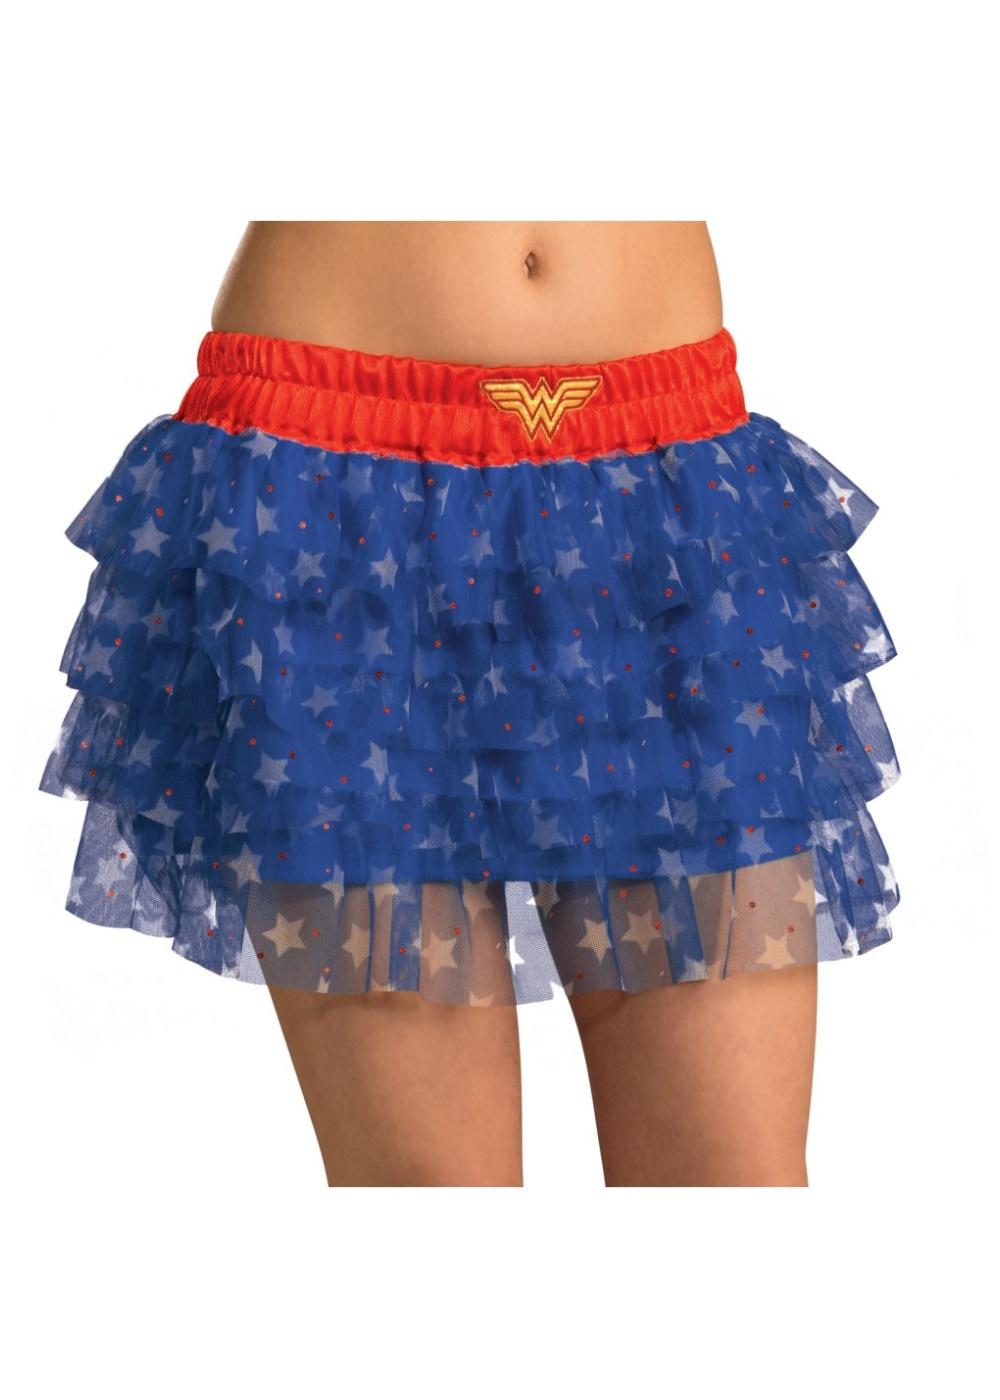 Adult wonder woman skirt-6969